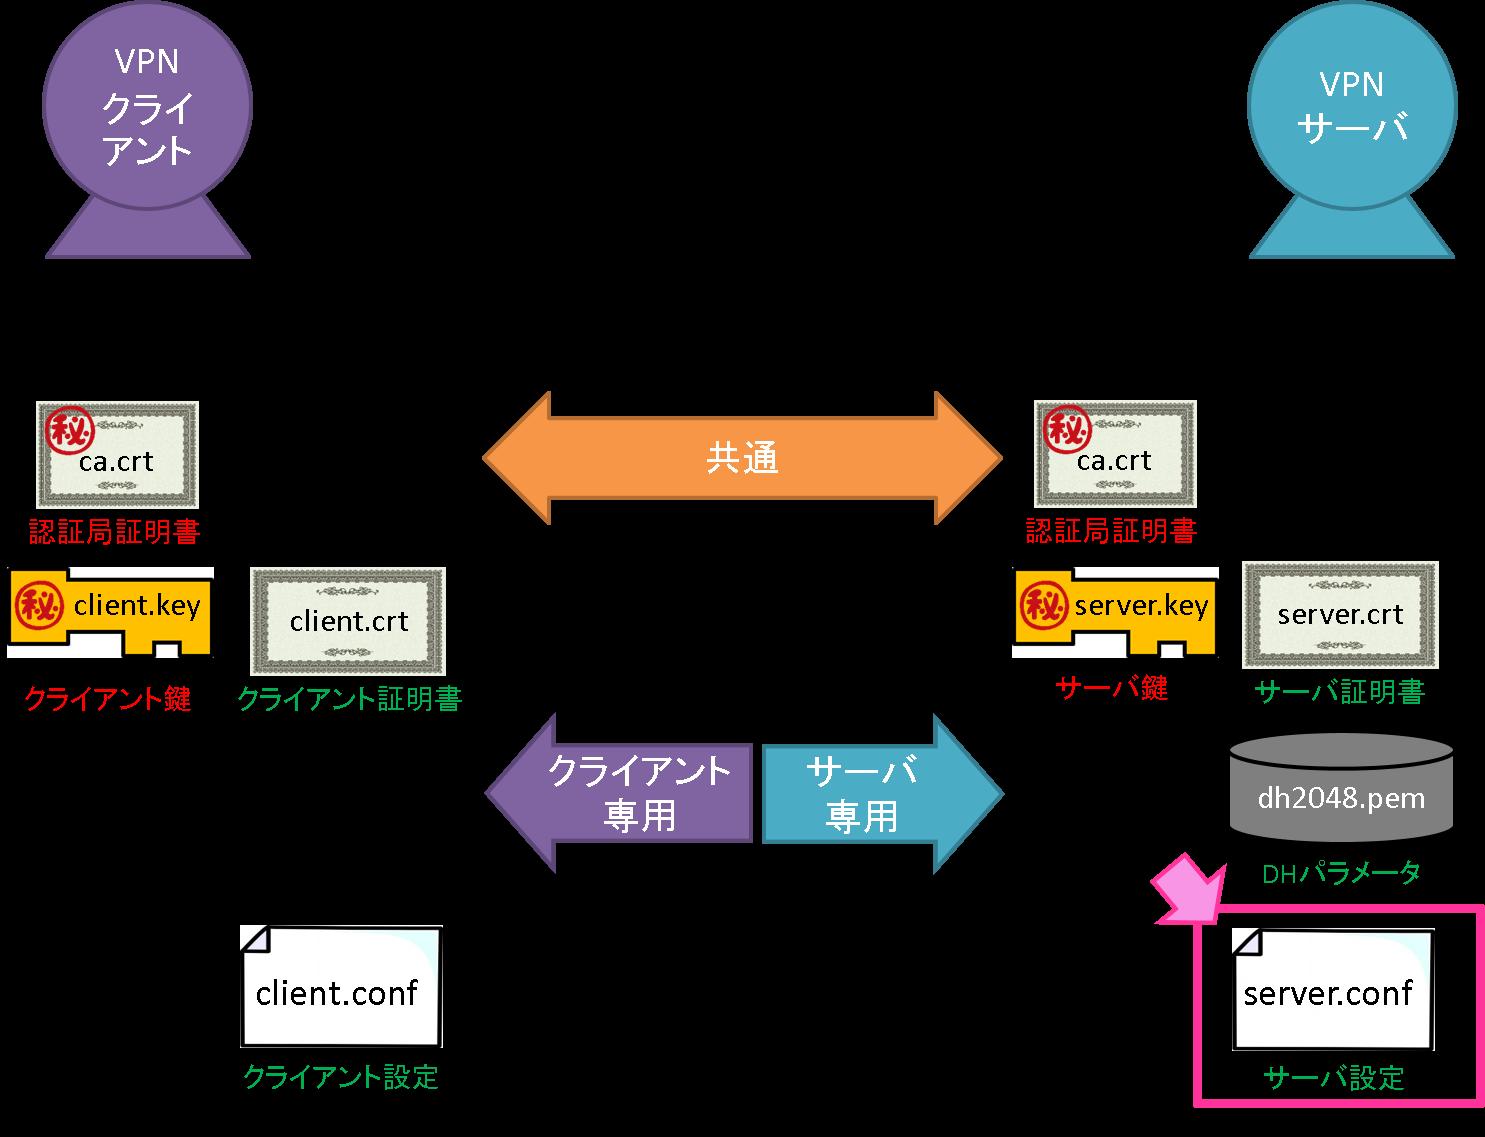 02_server_conf.png